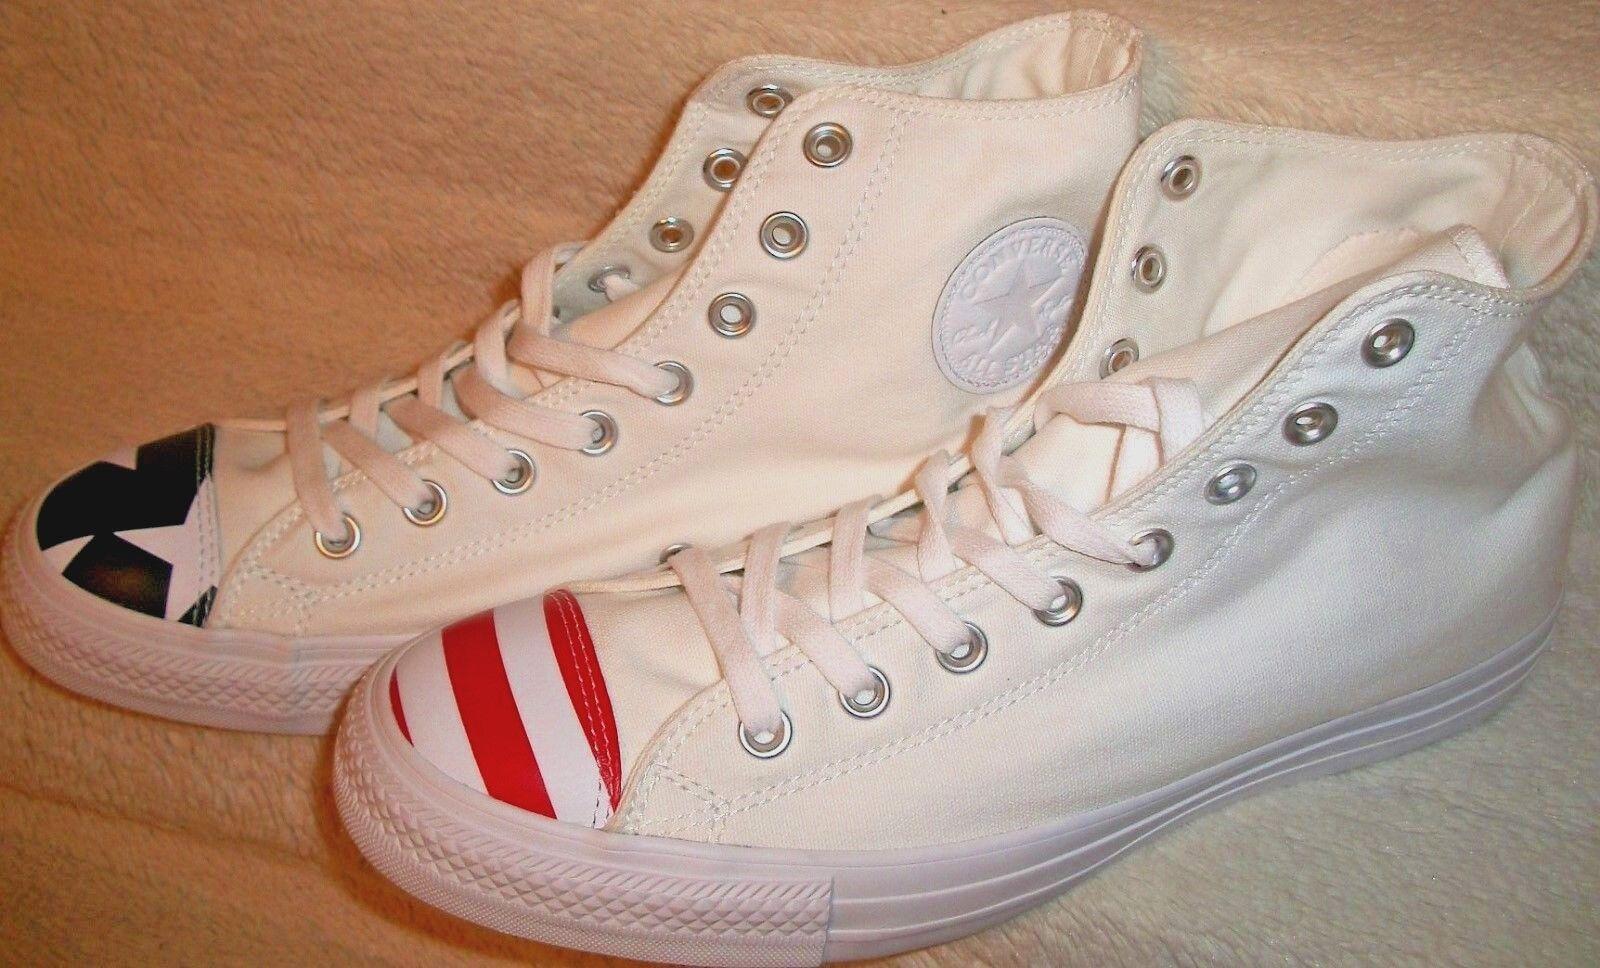 Converse 153911C CTAS White with Flag Toe Cap Men's 8- Women's 10